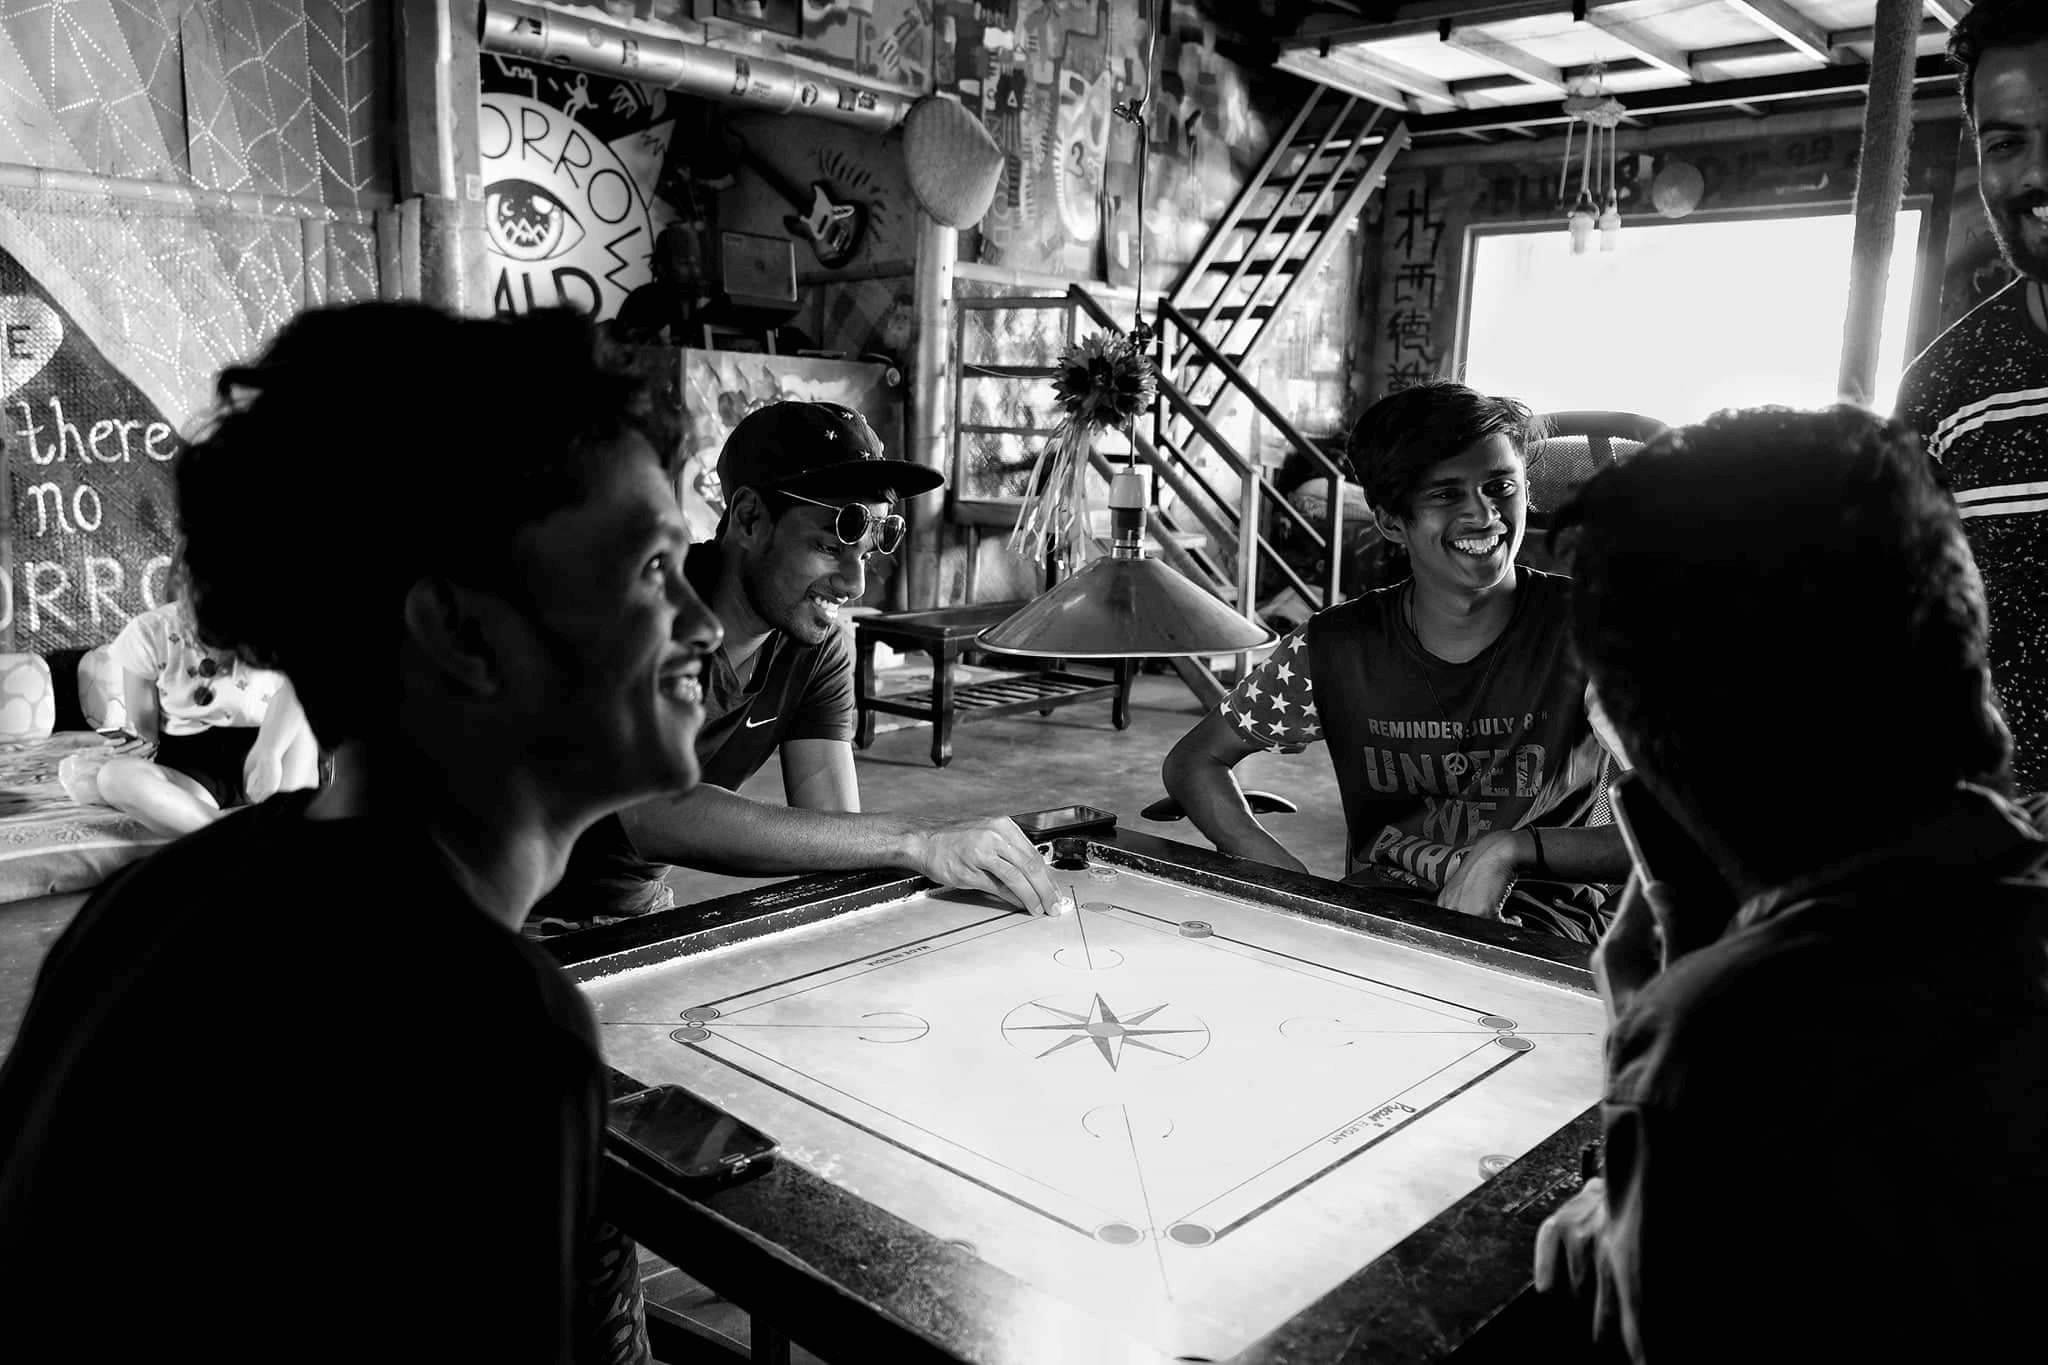 The boys playing Carom at Sri Lanka's best hostel